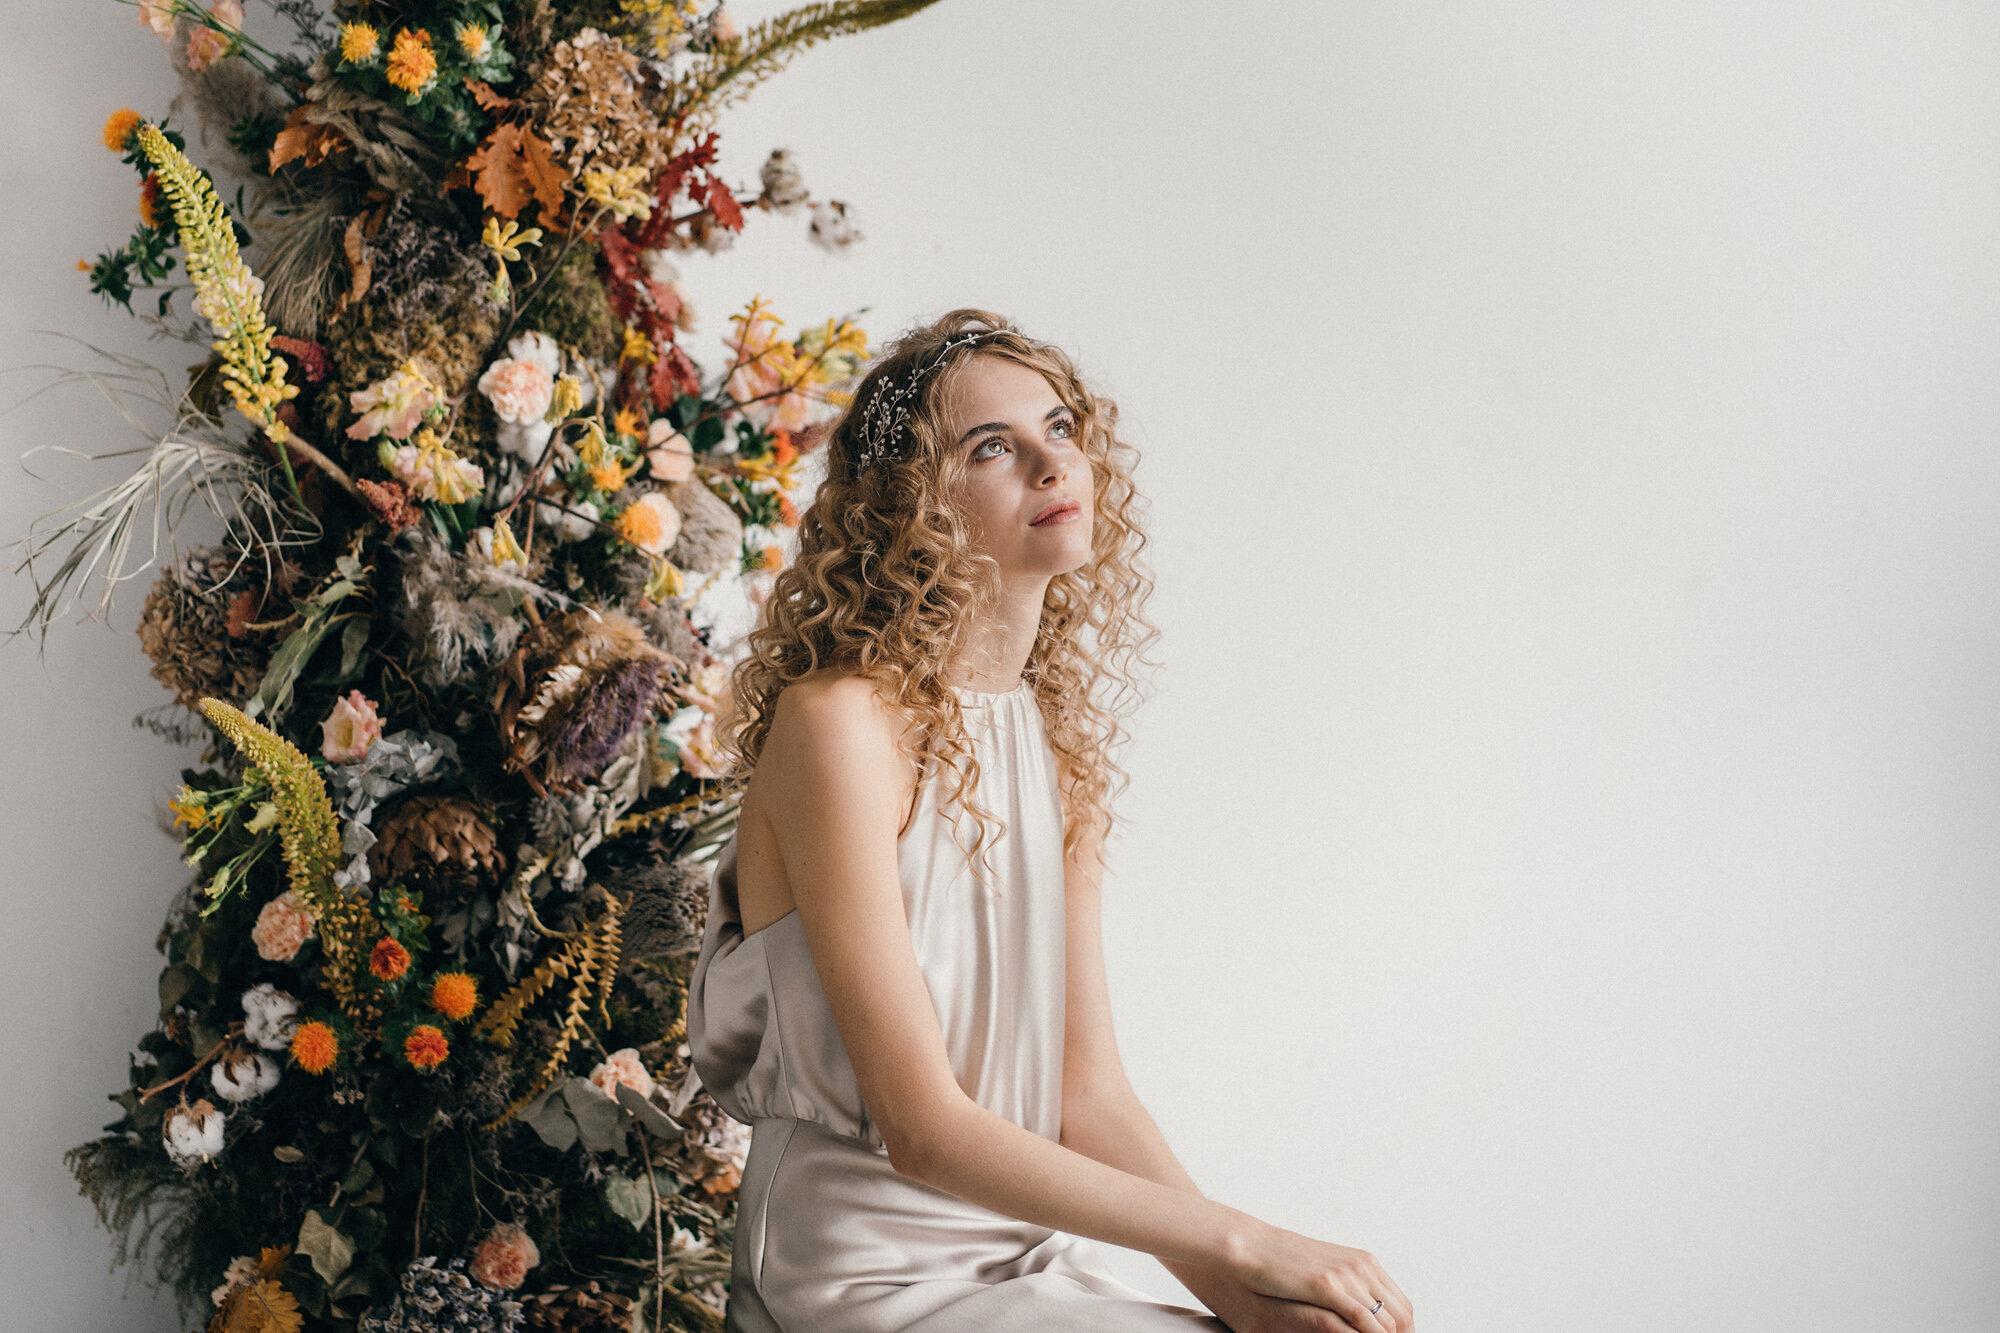 Debbie-Carlisle-Bridal-Accessories-Kate-Beaumont-Wedding-Gowns-Sheffield-Yorkshire-UK-10.jpg